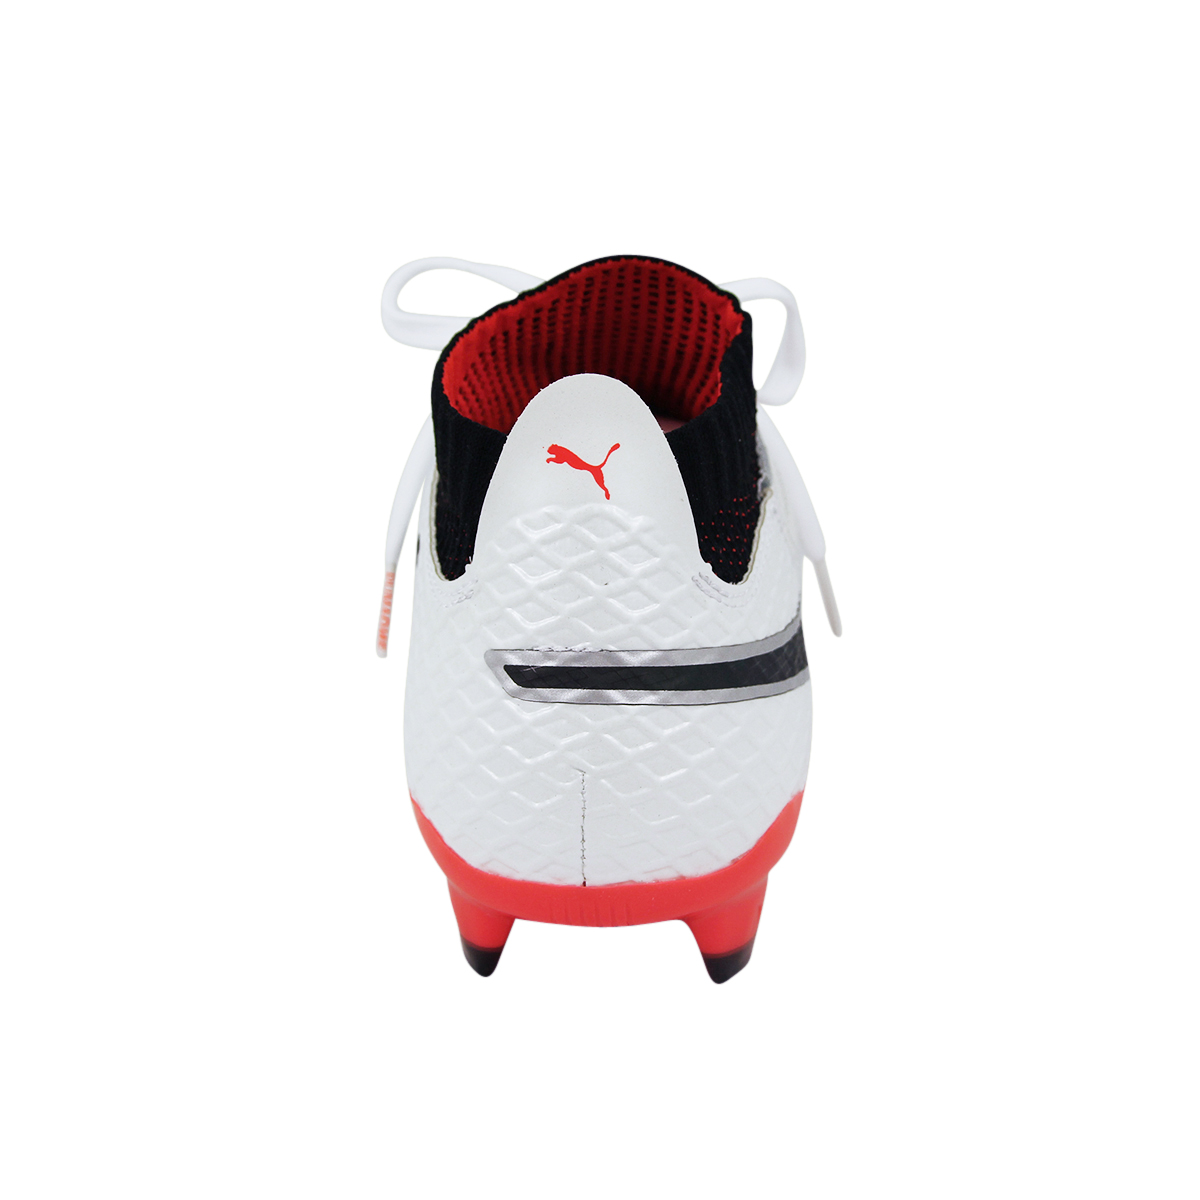 Schuhe Fußball Leder Leder Leder PUMA ONE 17 1 FG 5d1d61